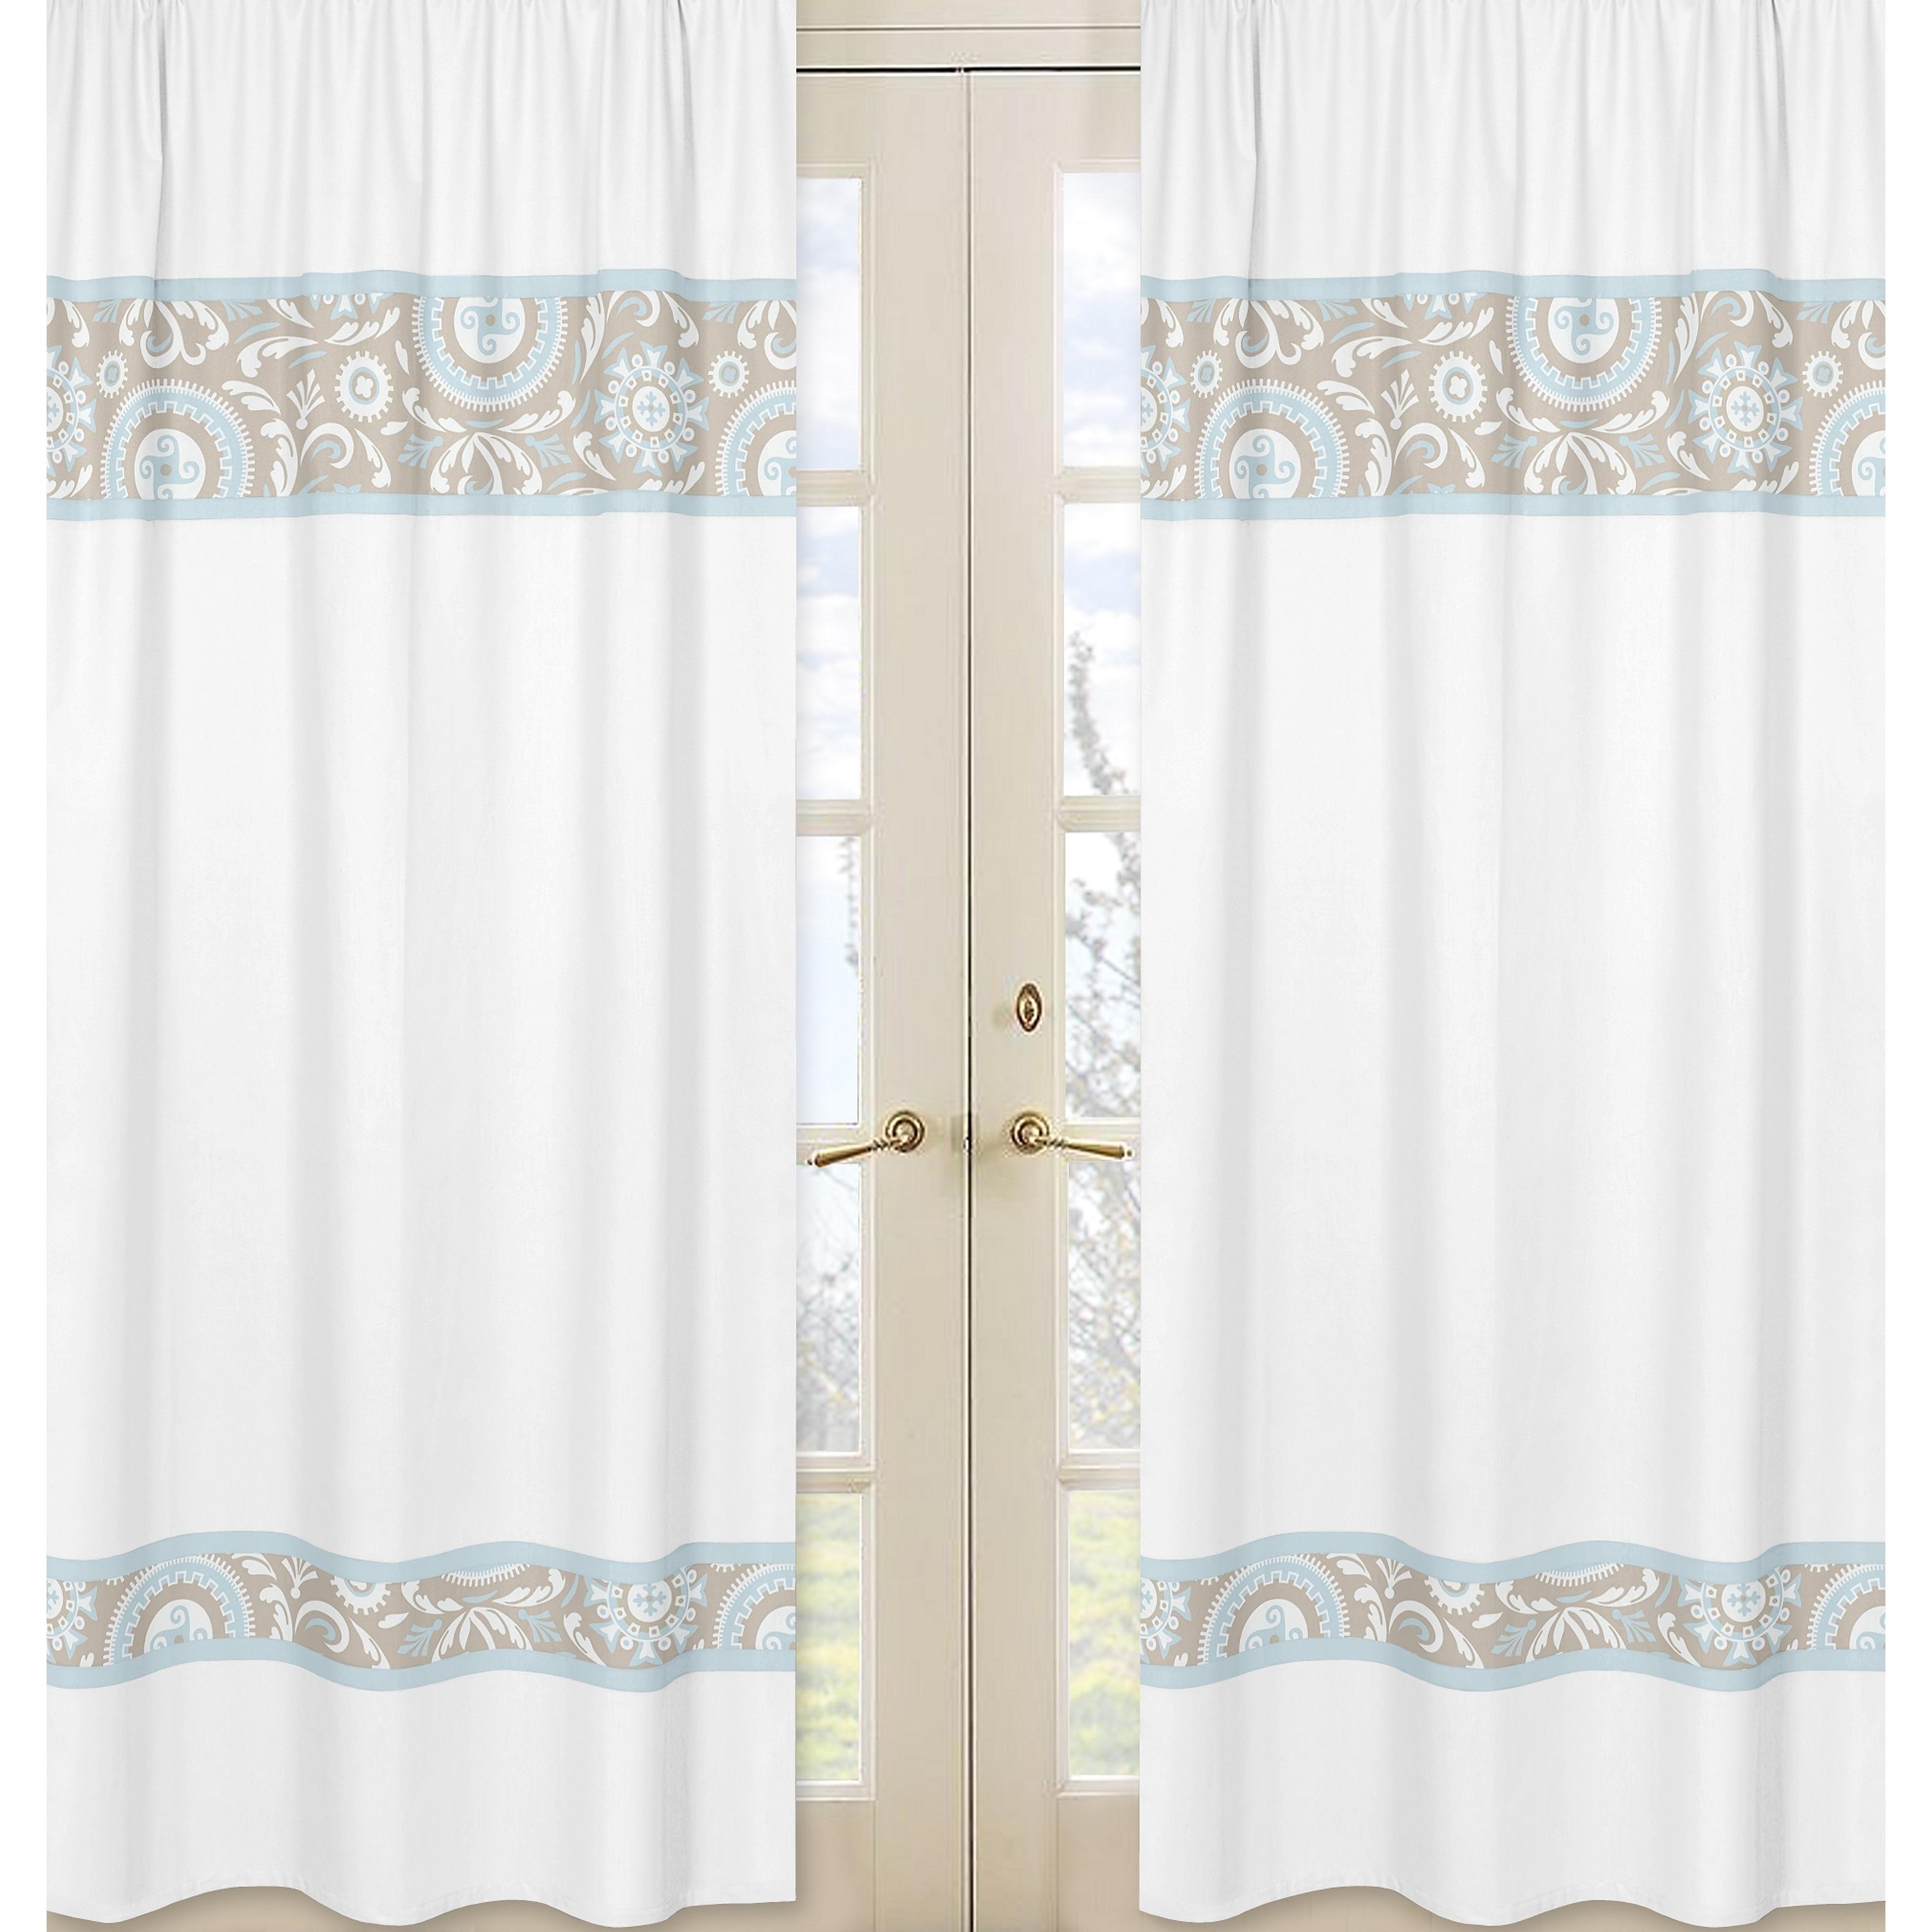 JoJo Designs Spa Blue, Taupe and White 84-inch Window Tre...